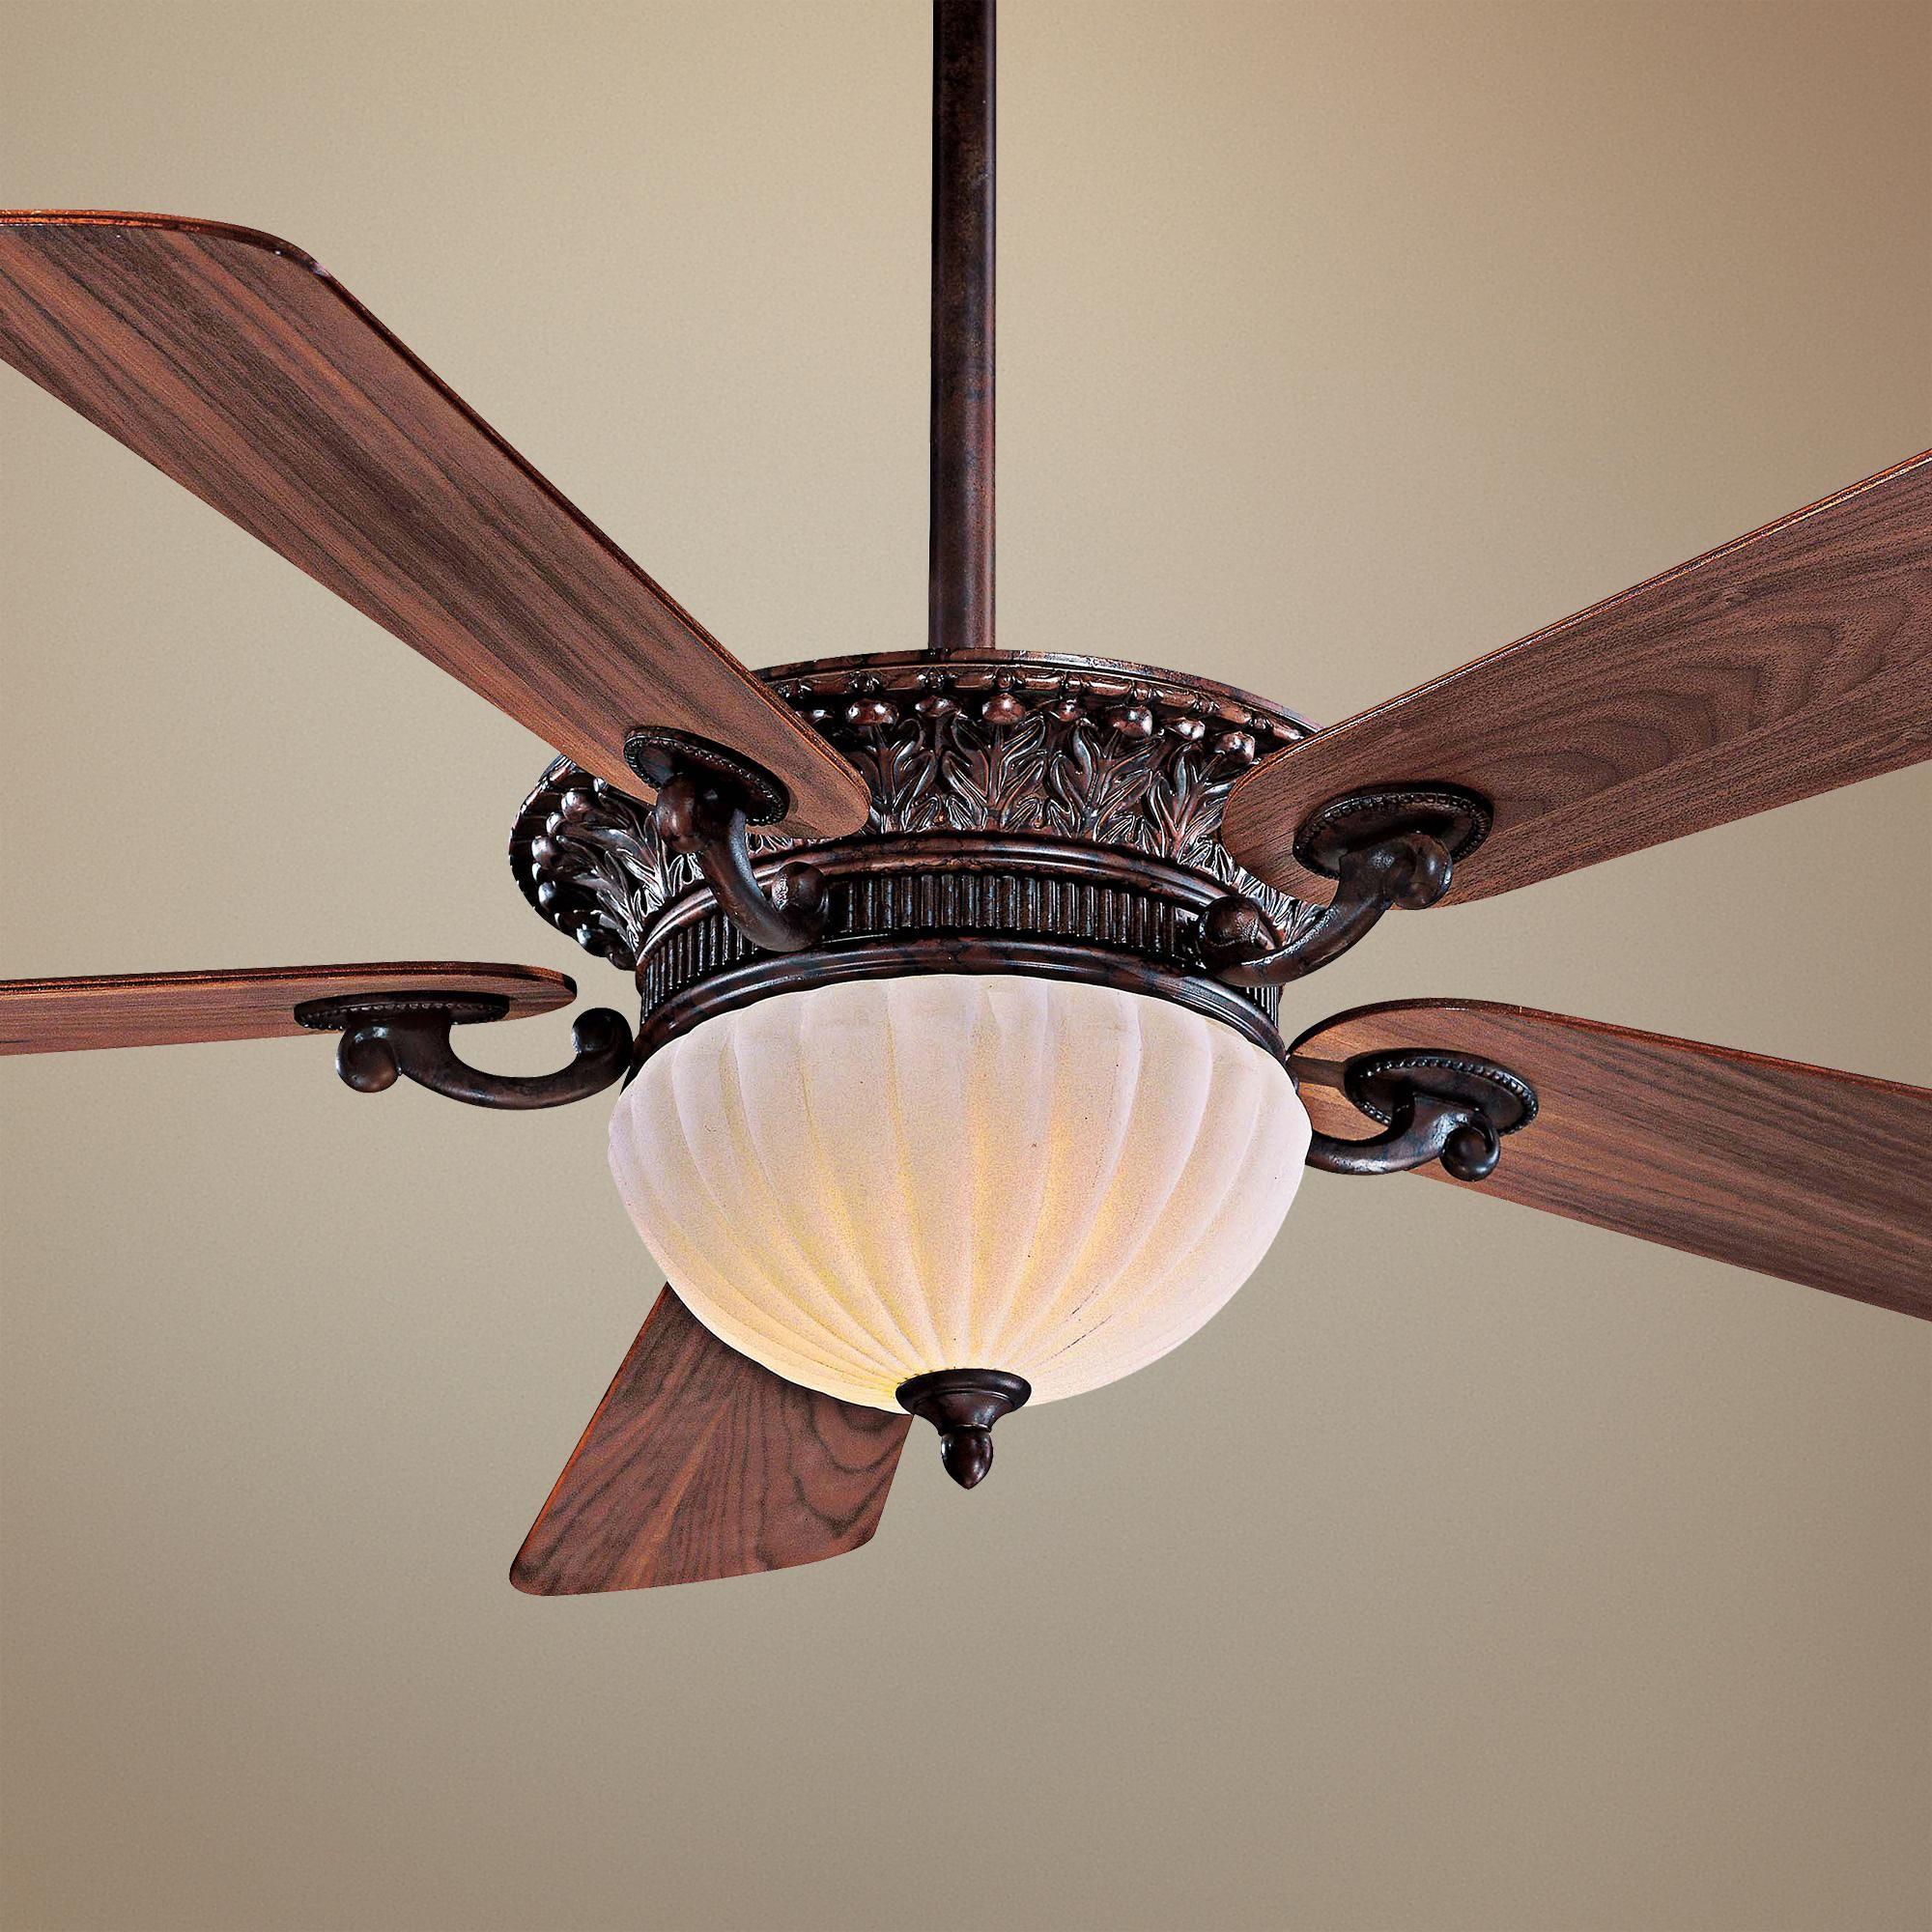 52 Minka Aire Volterra Bronze Ceiling Fan 96551 Lamps Plus Ceiling Fan Bronze Ceiling Fan Ceiling Fan With Light